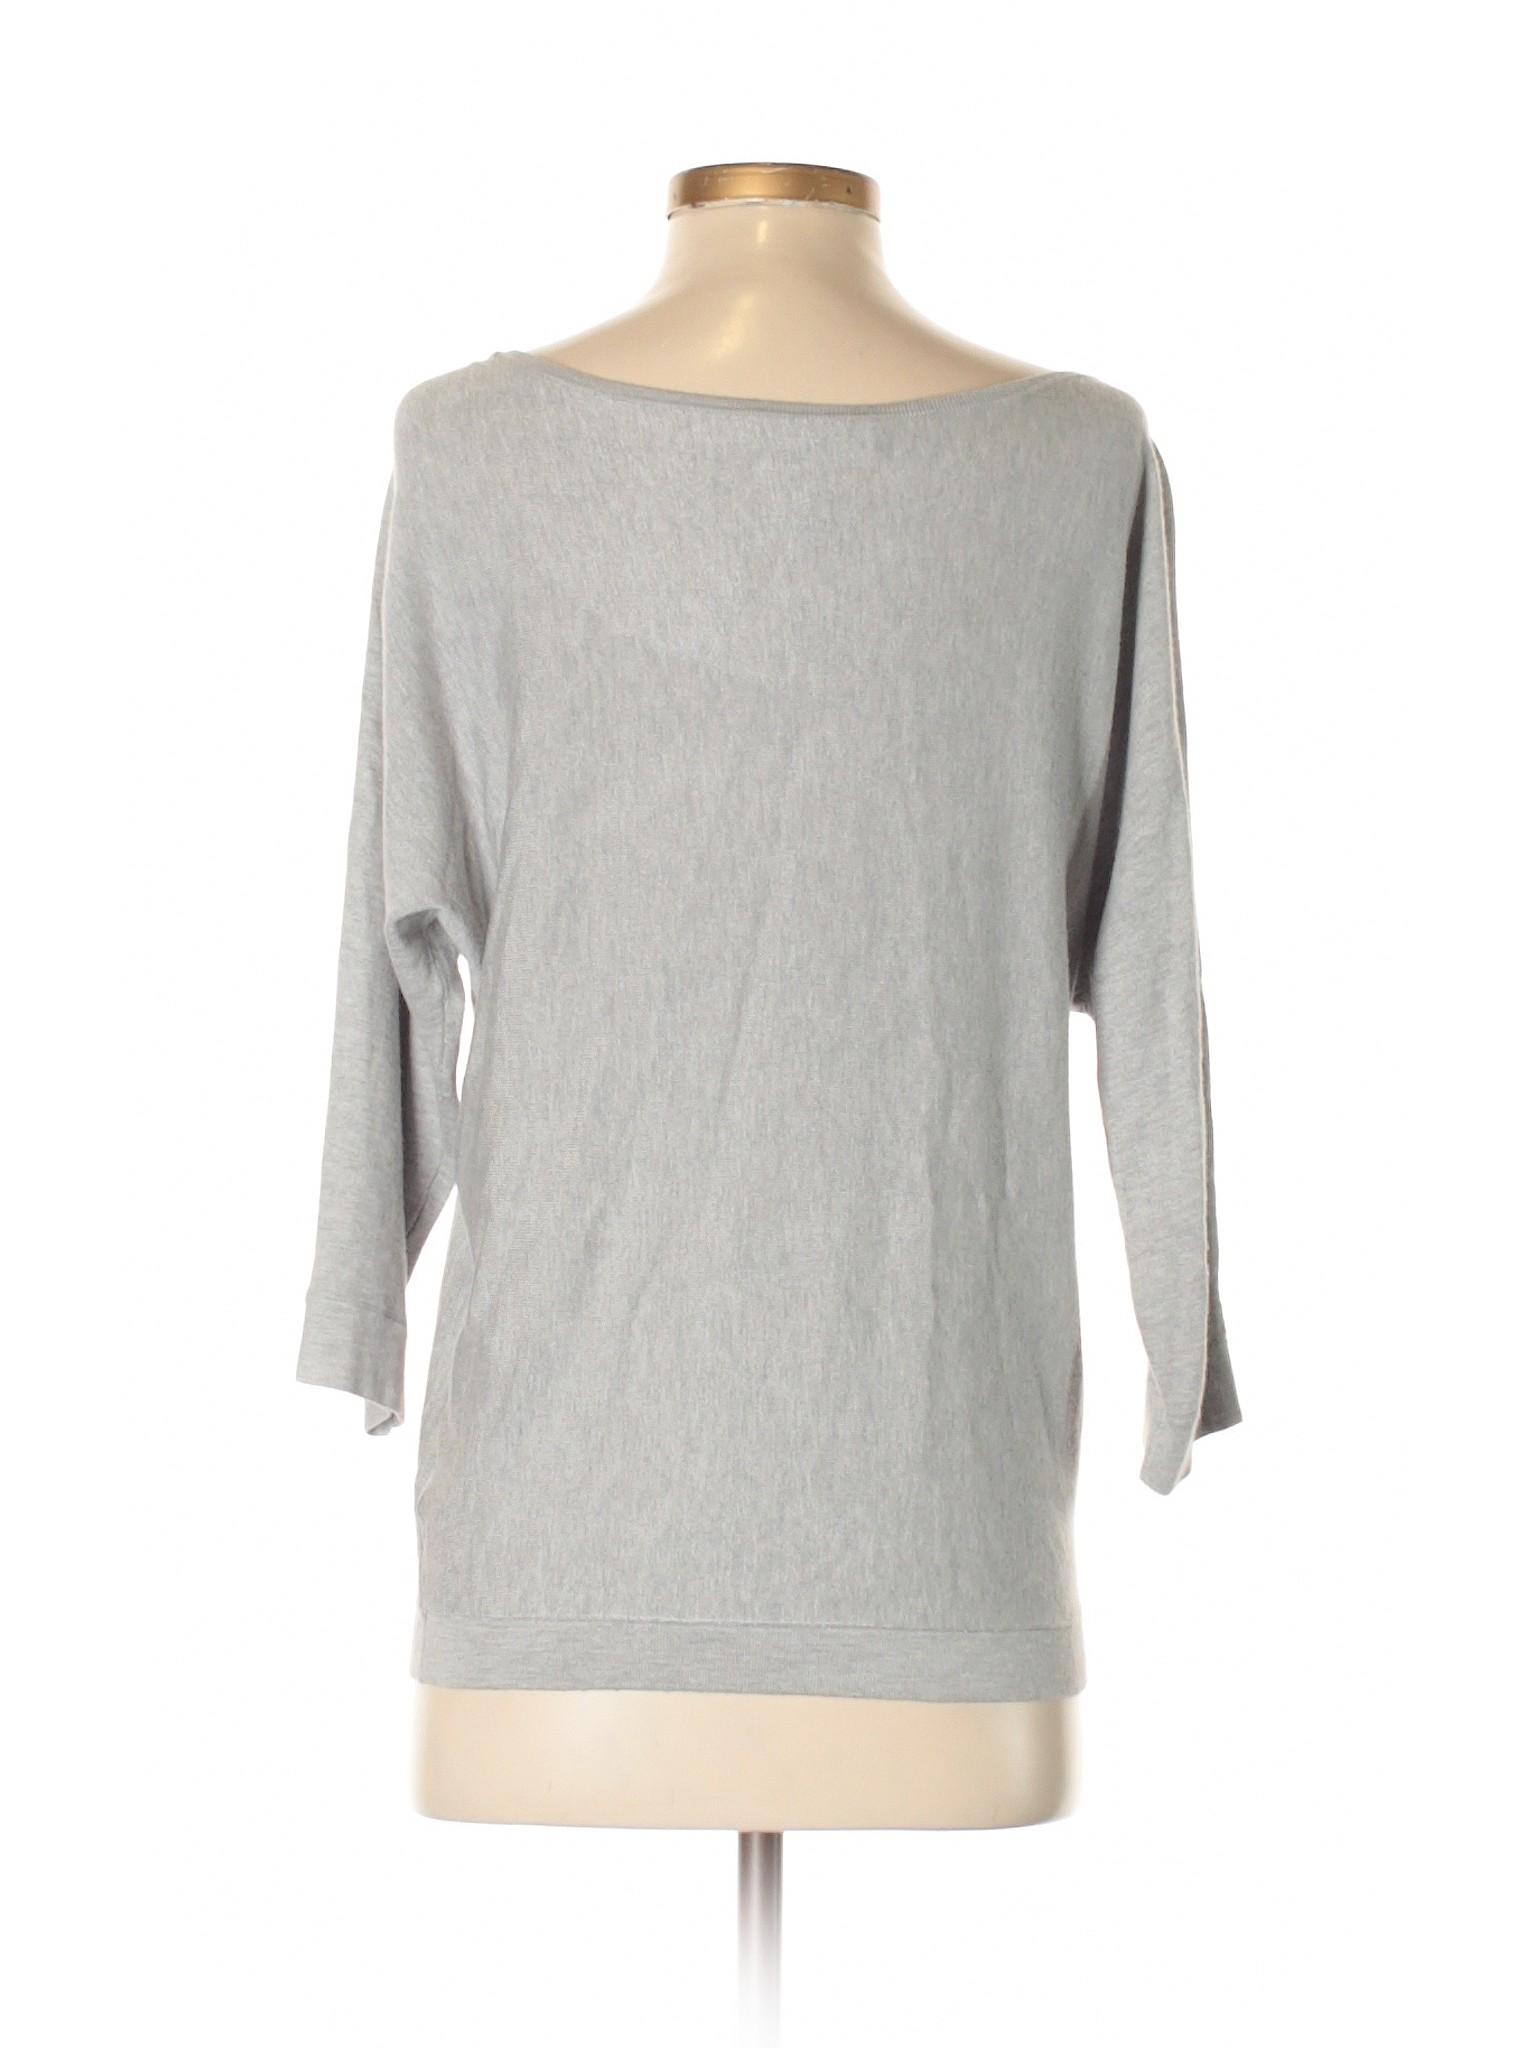 Market Sweater White Pullover Boutique Black House YwvZqOf0